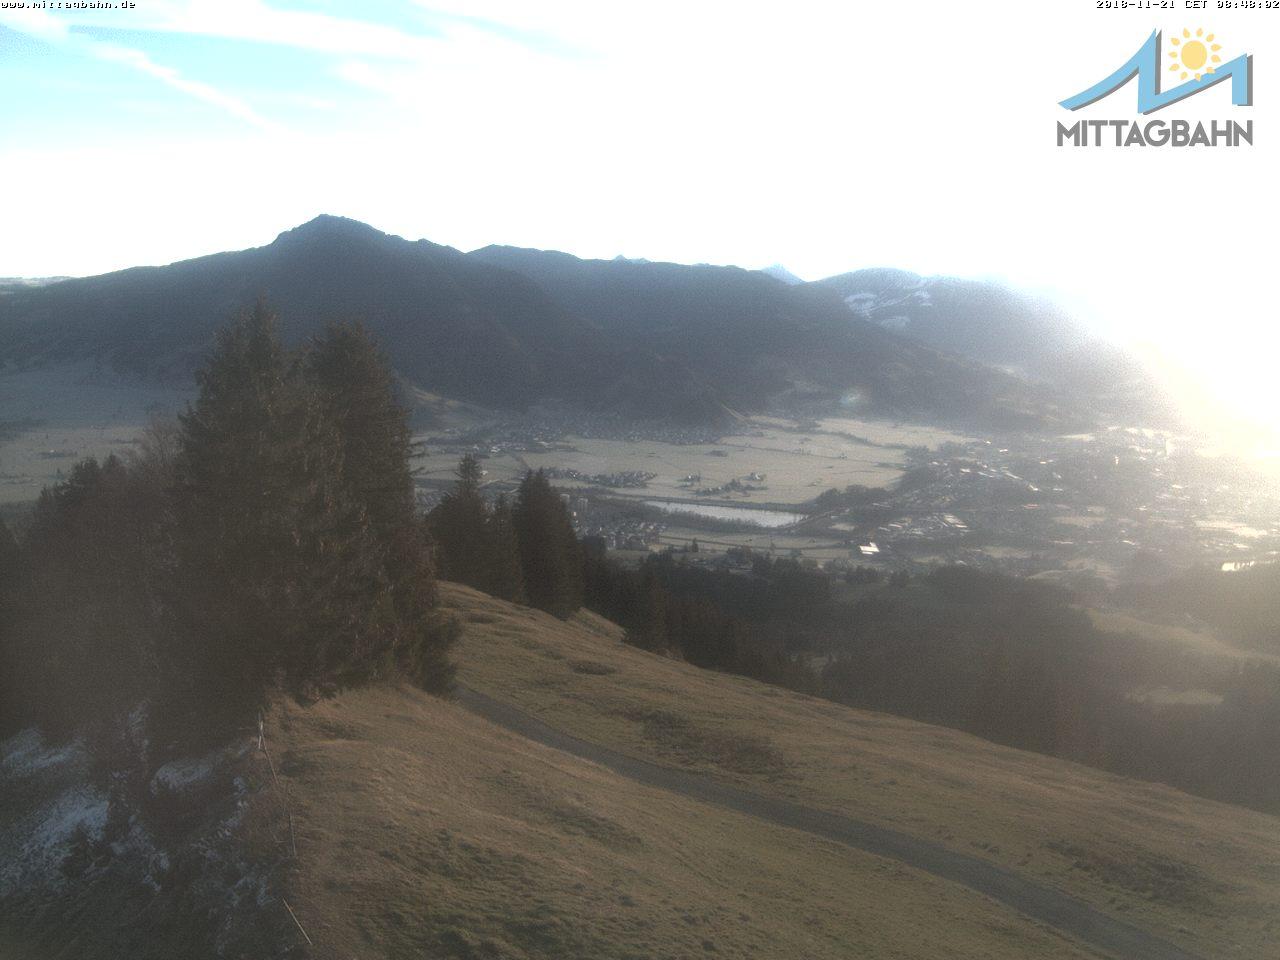 Webcam Skigebied Immenstadt - Mittag cam 6 - Allgäuer Alpen